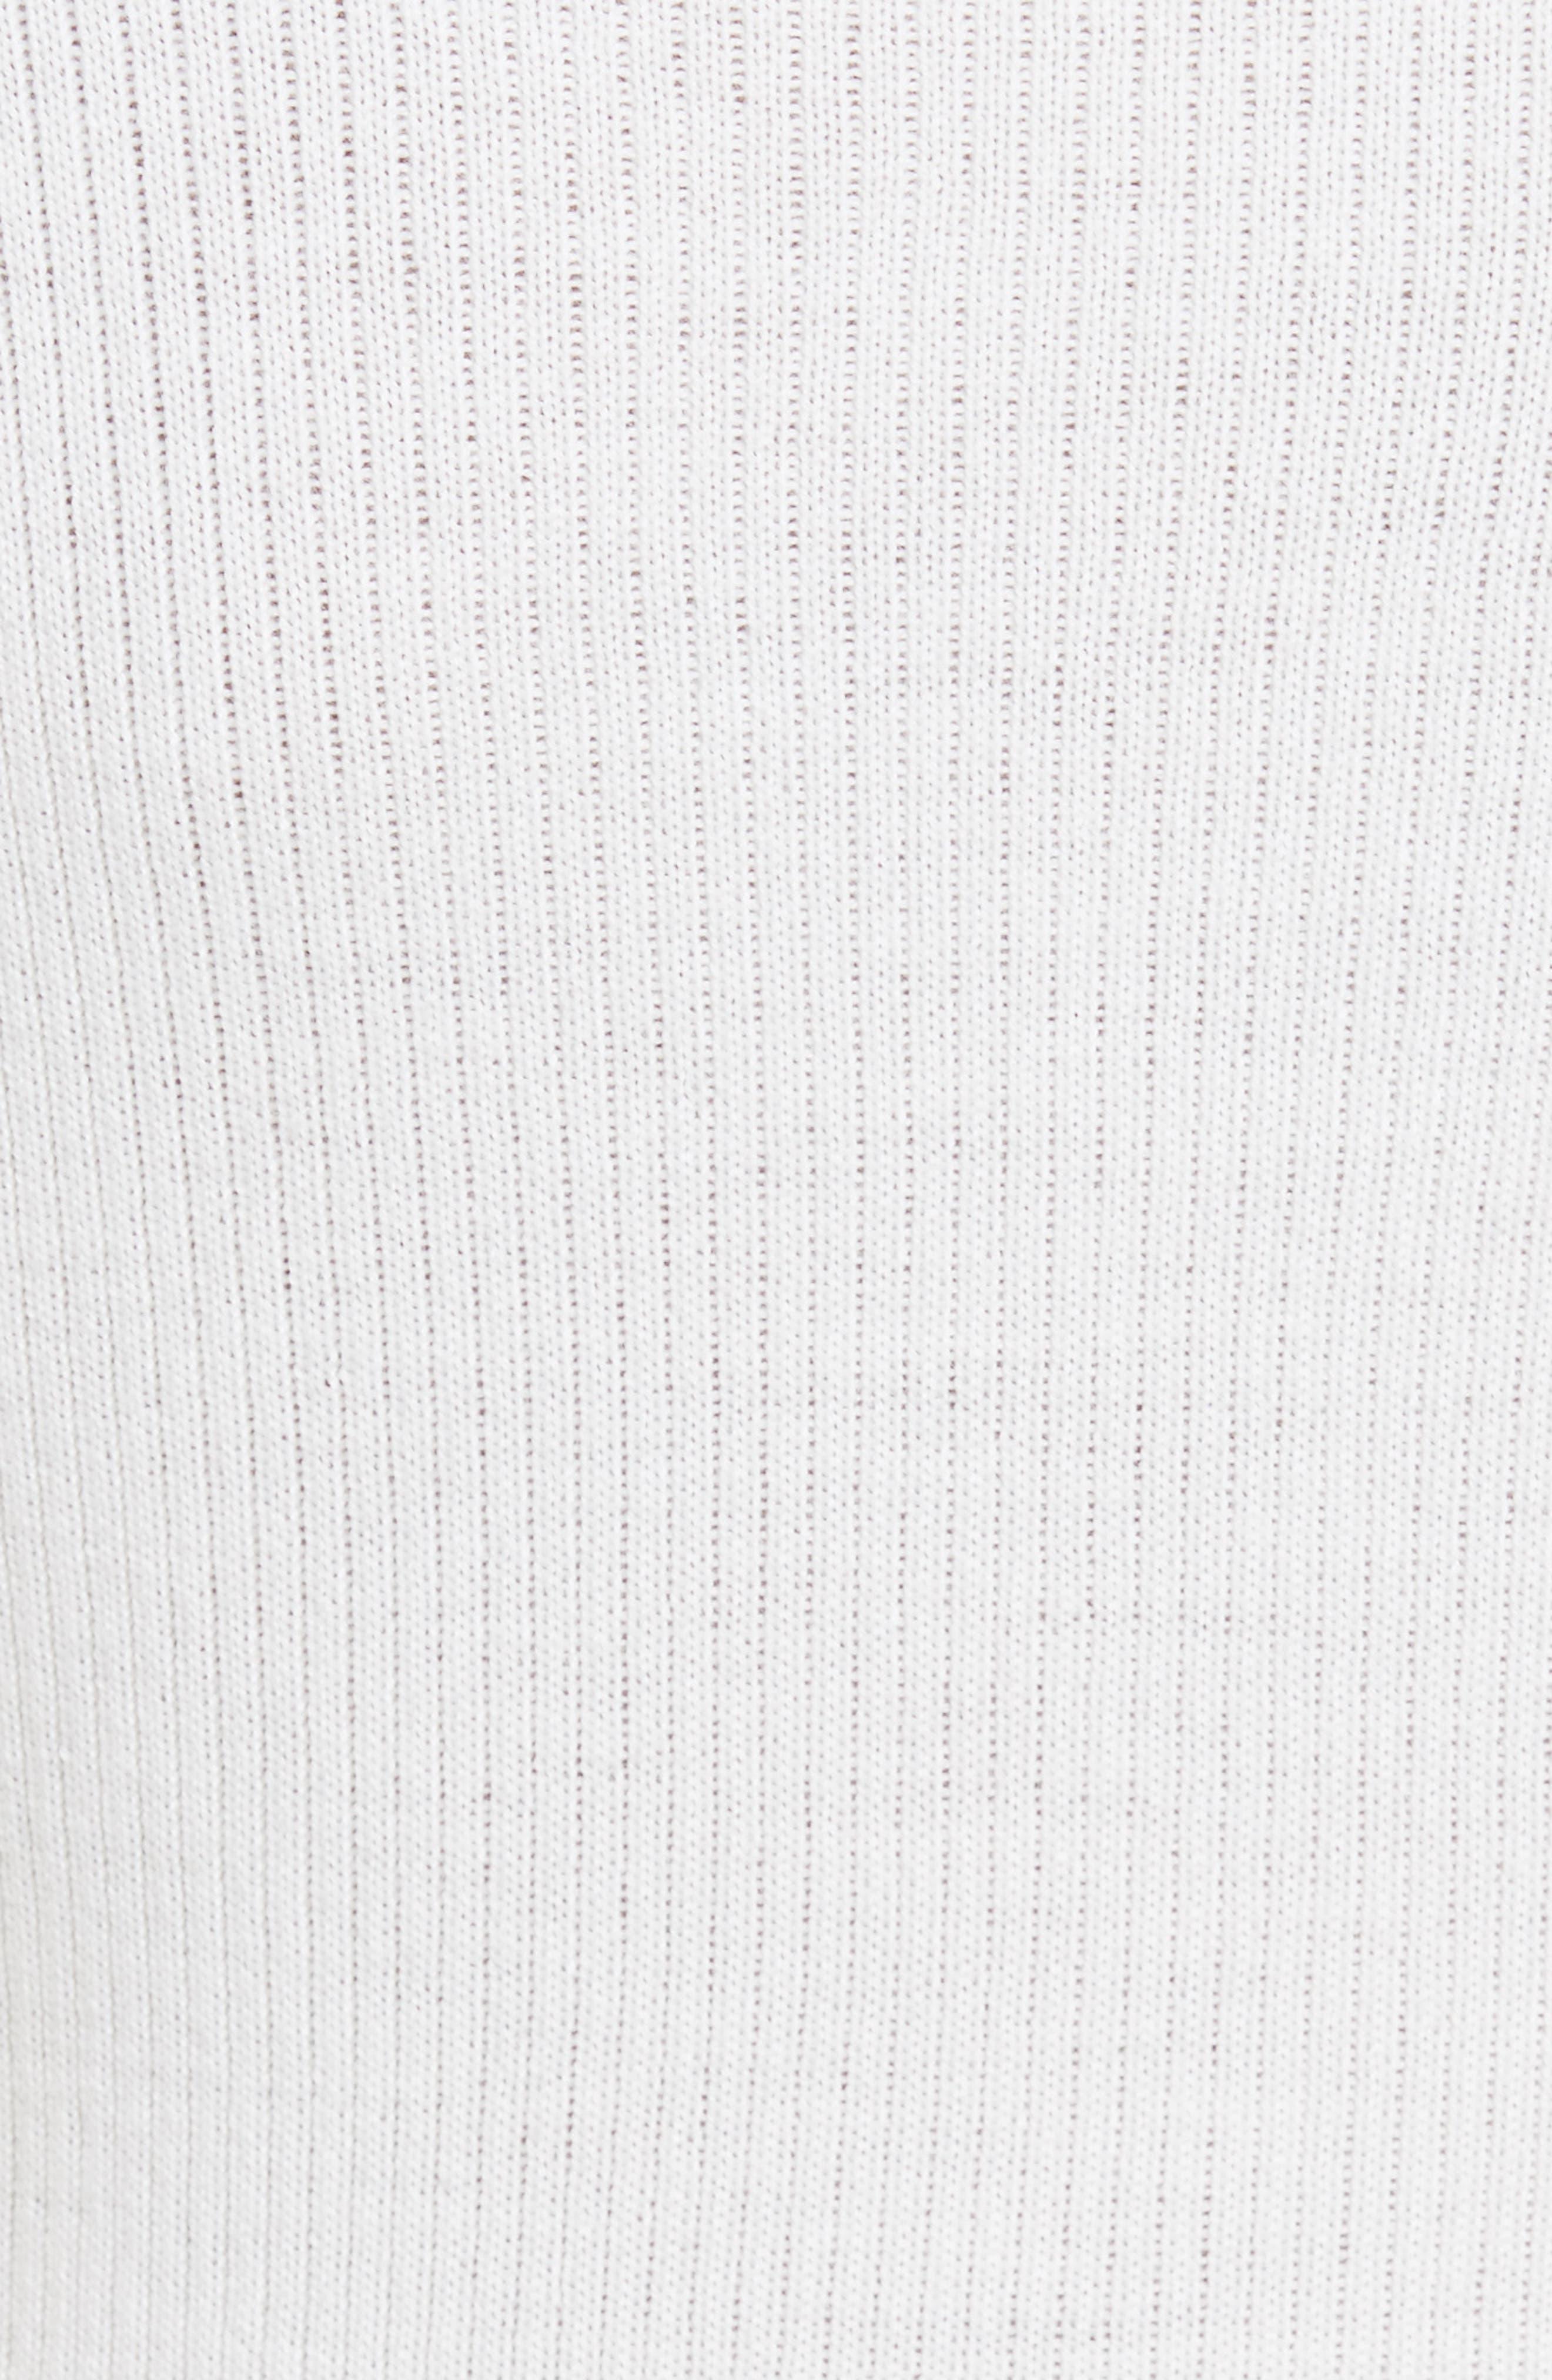 Metallic Knit Merino Wool Blend Sweater,                             Alternate thumbnail 5, color,                             199